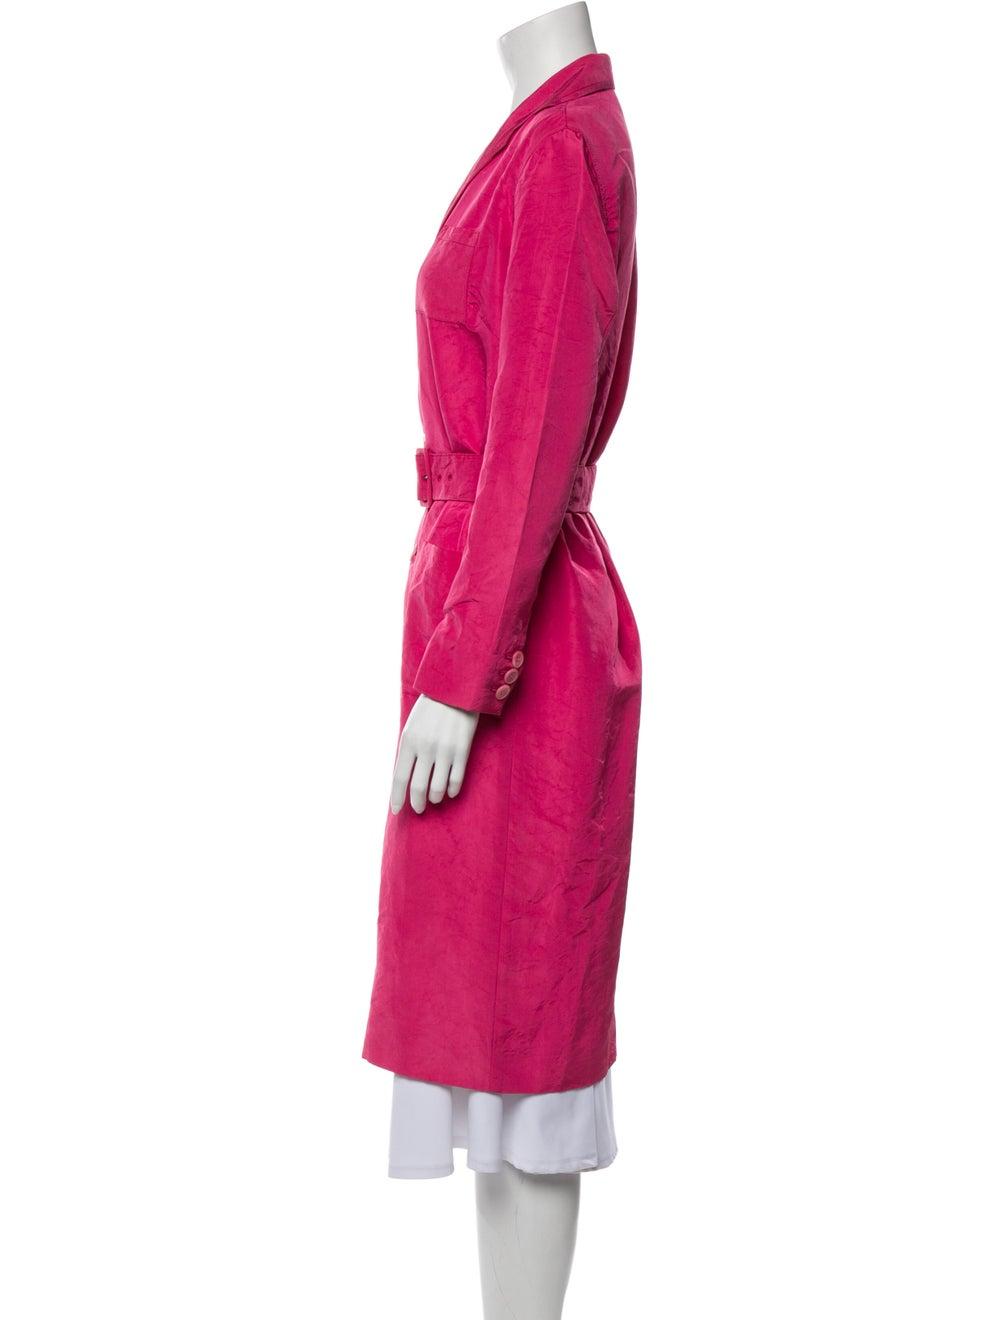 Prada Silk Trench Coat Pink - image 2